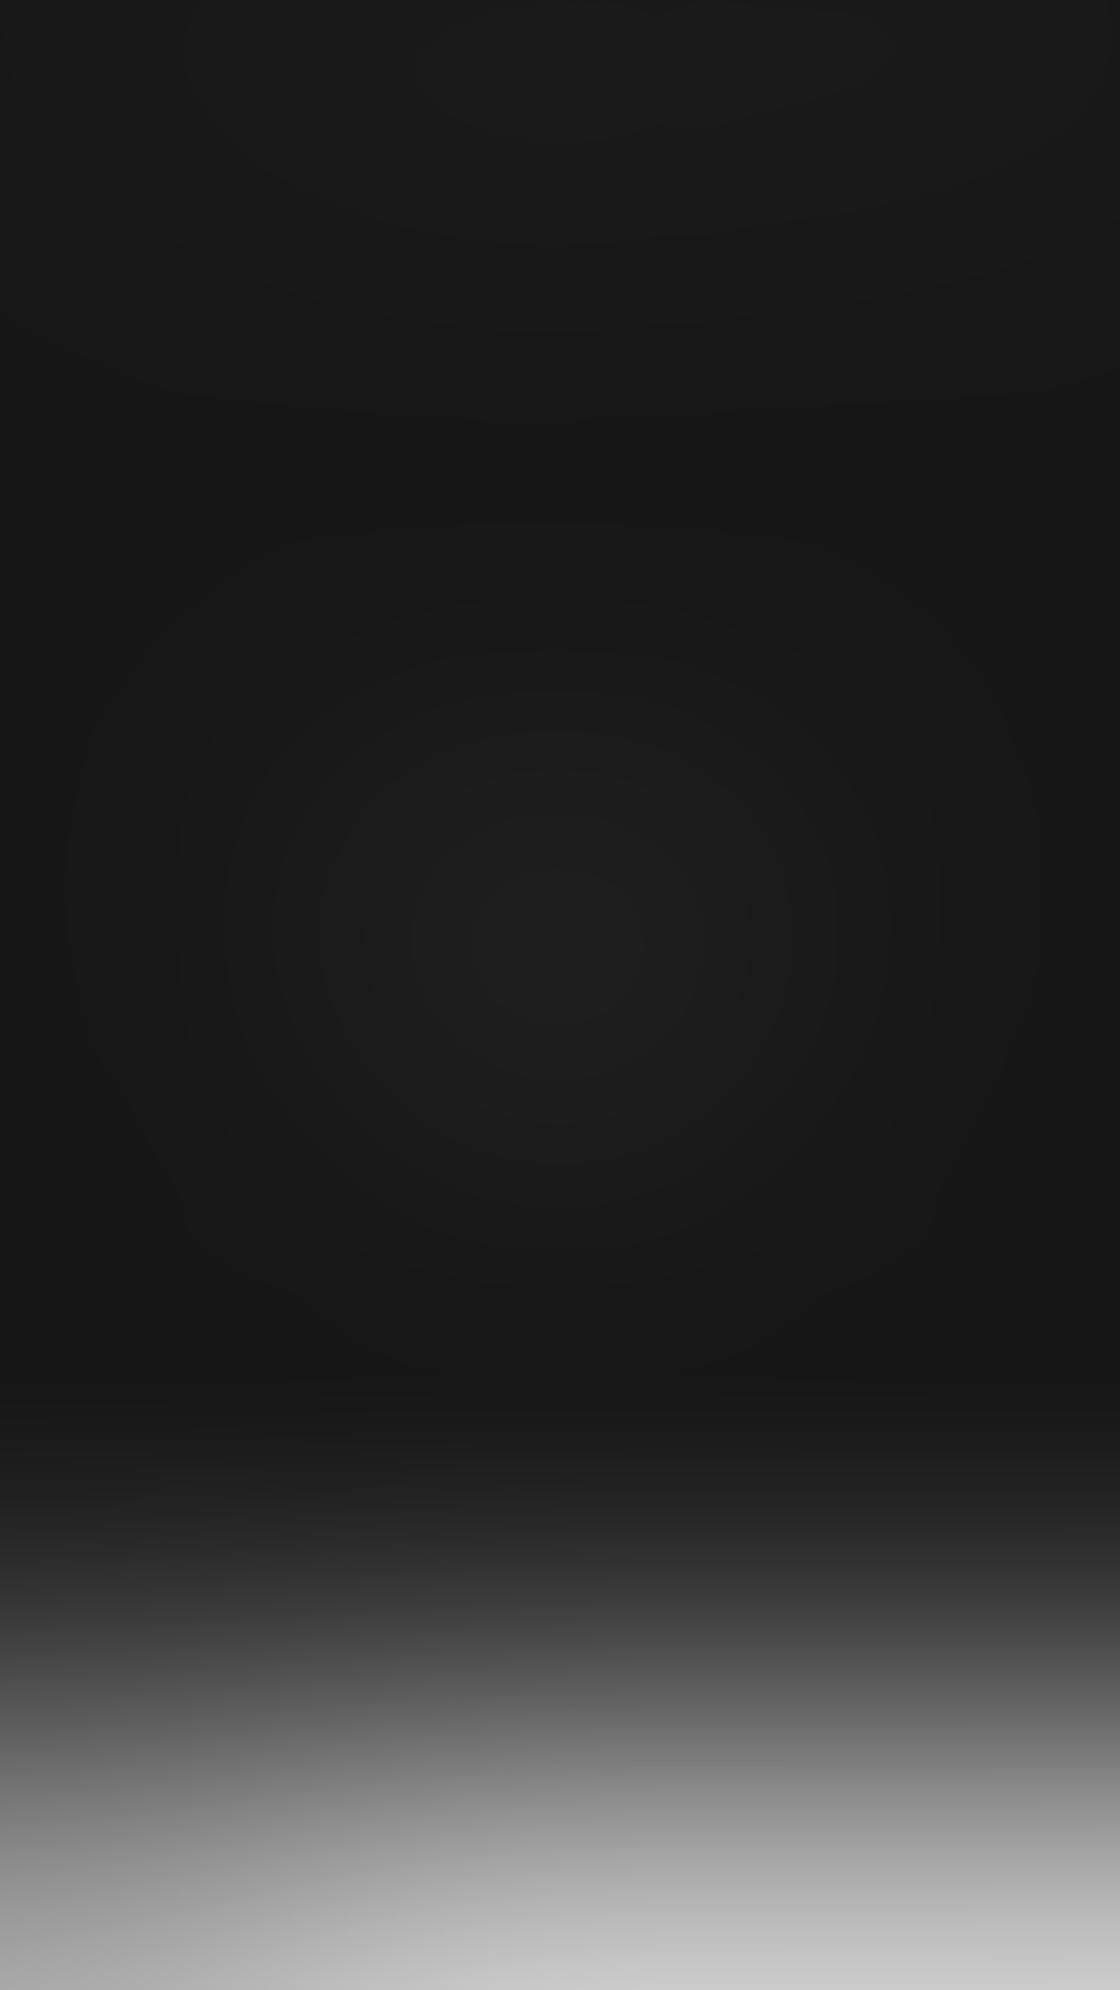 Lens Distortions iPhone App 7